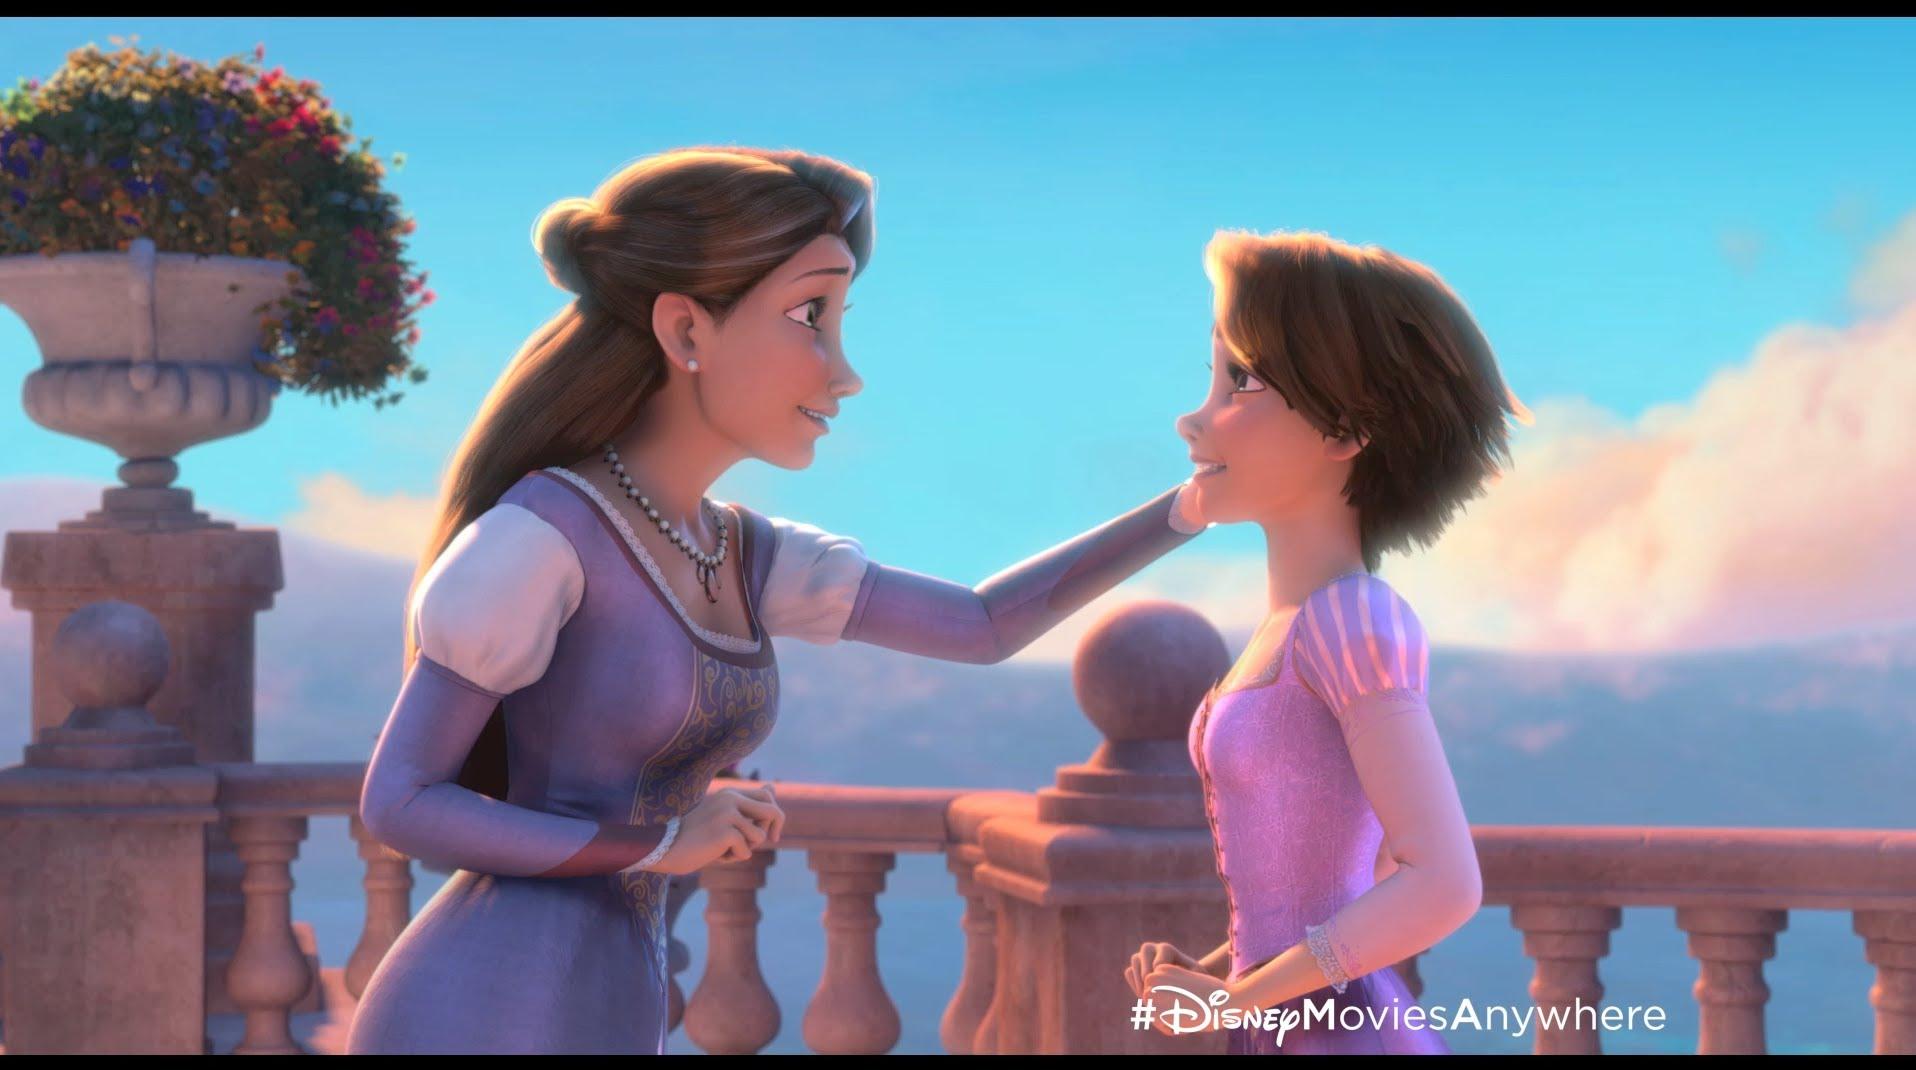 Happy Mother's Day – Disney Movies